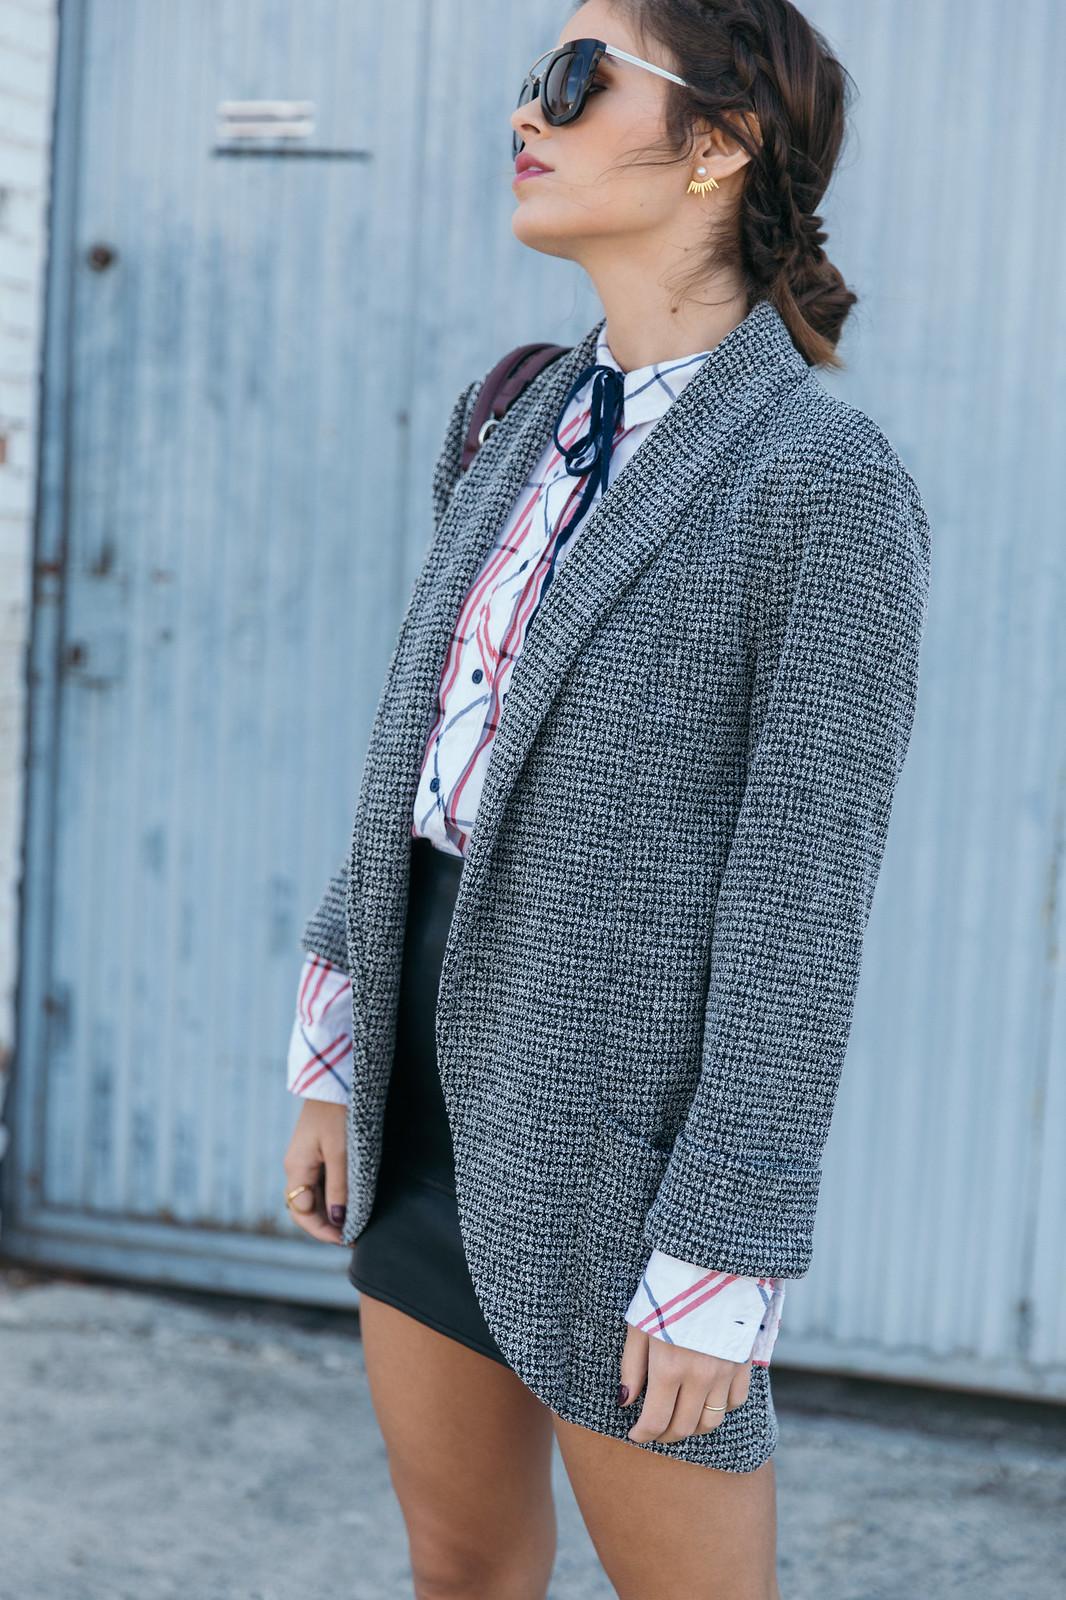 Jessie Chanes Seams for a desire - Black Boots Itshoes Parfois bag faux leather skirt-4